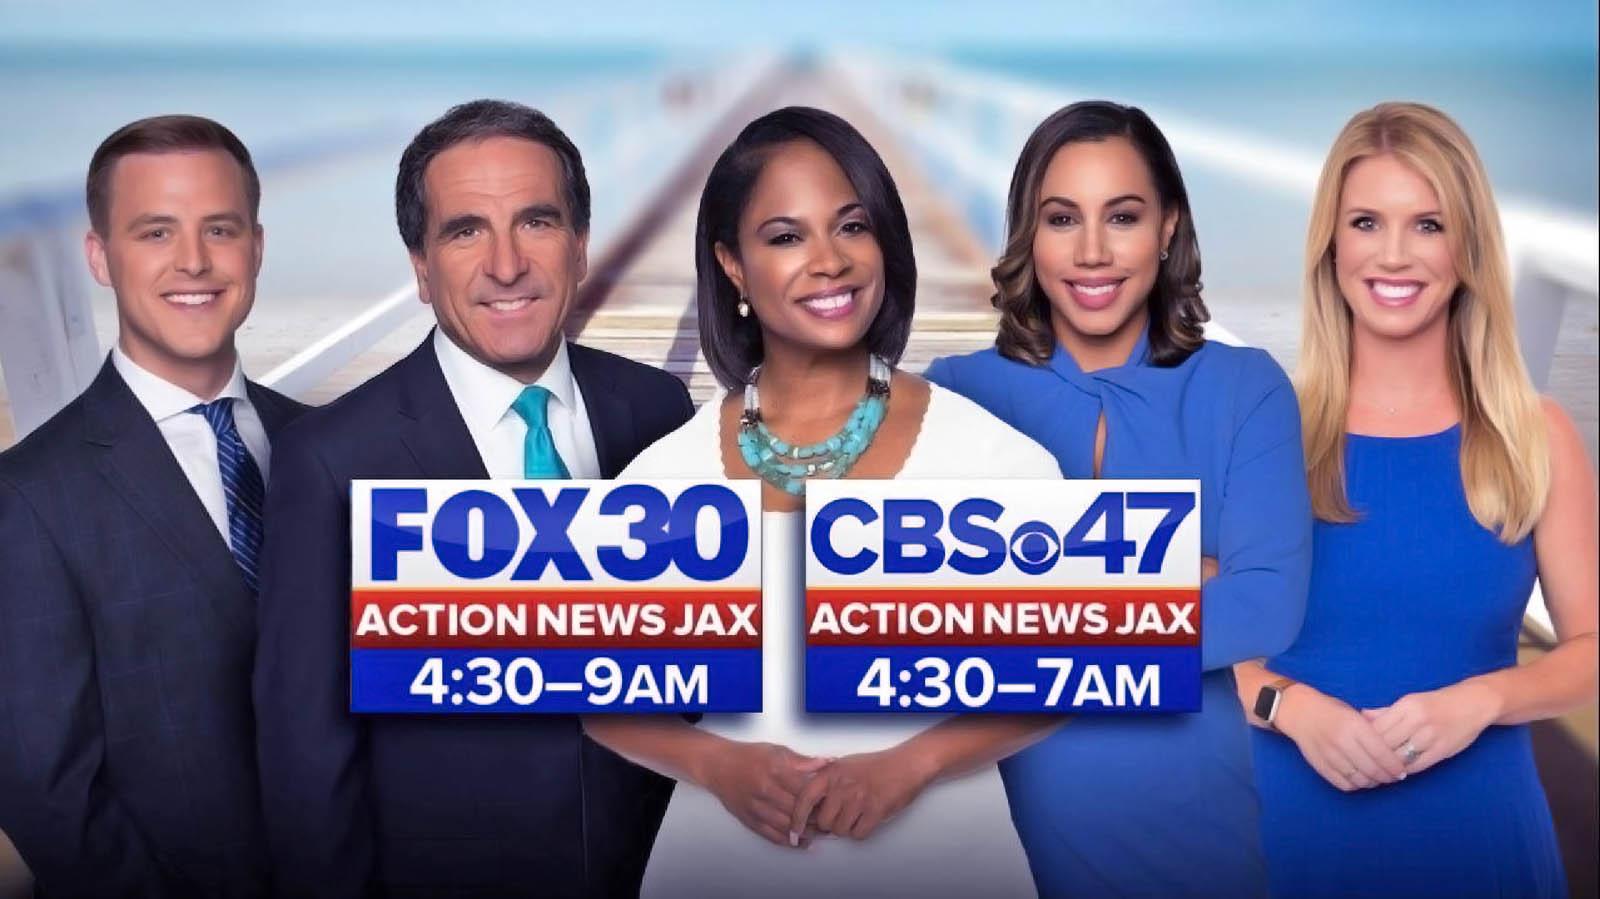 Action News Jax Weather Team